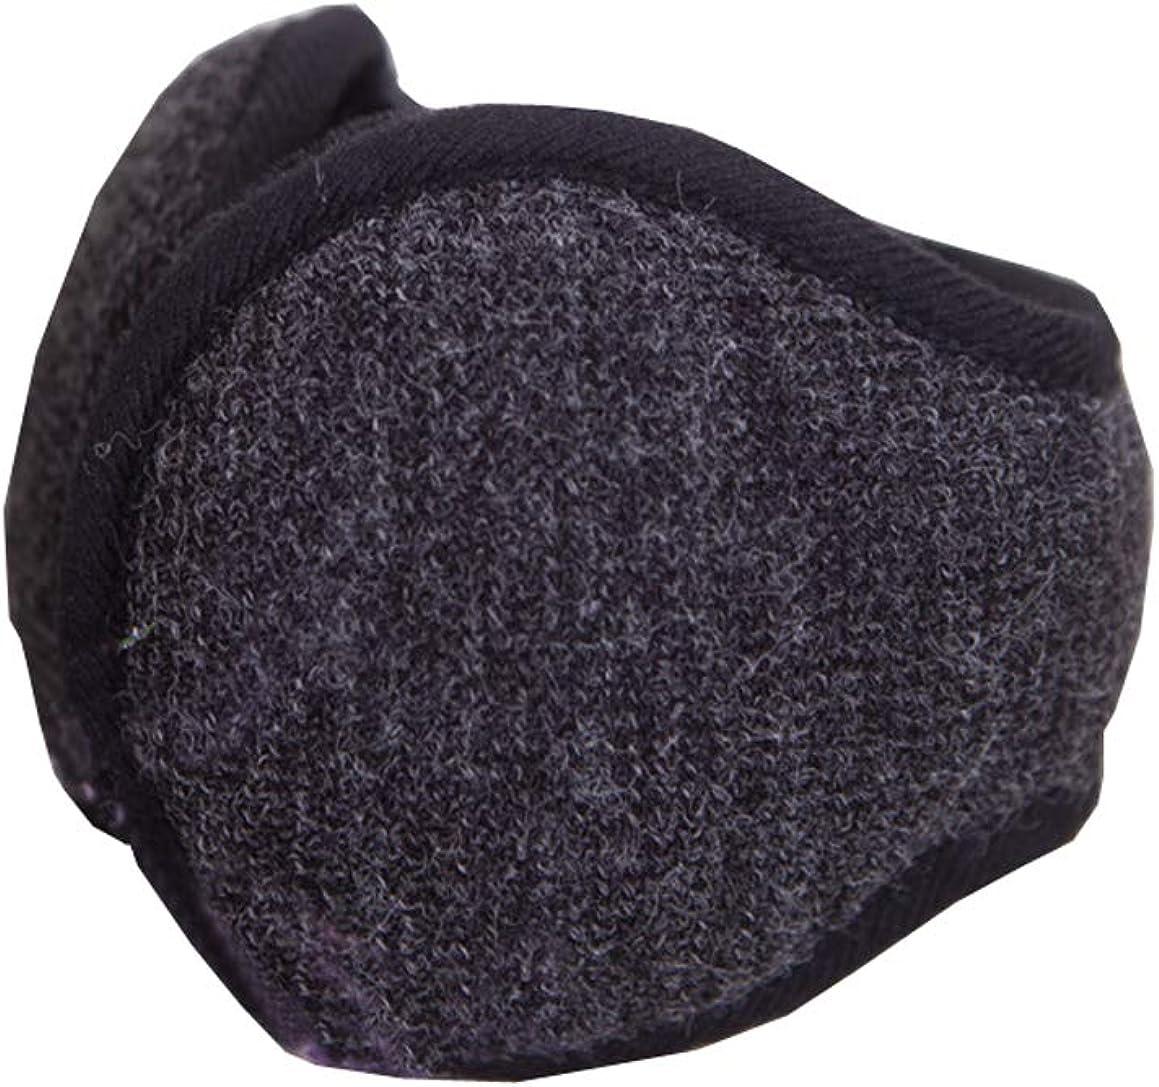 Only Faith Unisex Winter Warm Folding Portable Plush Earmuffs Ear Cover